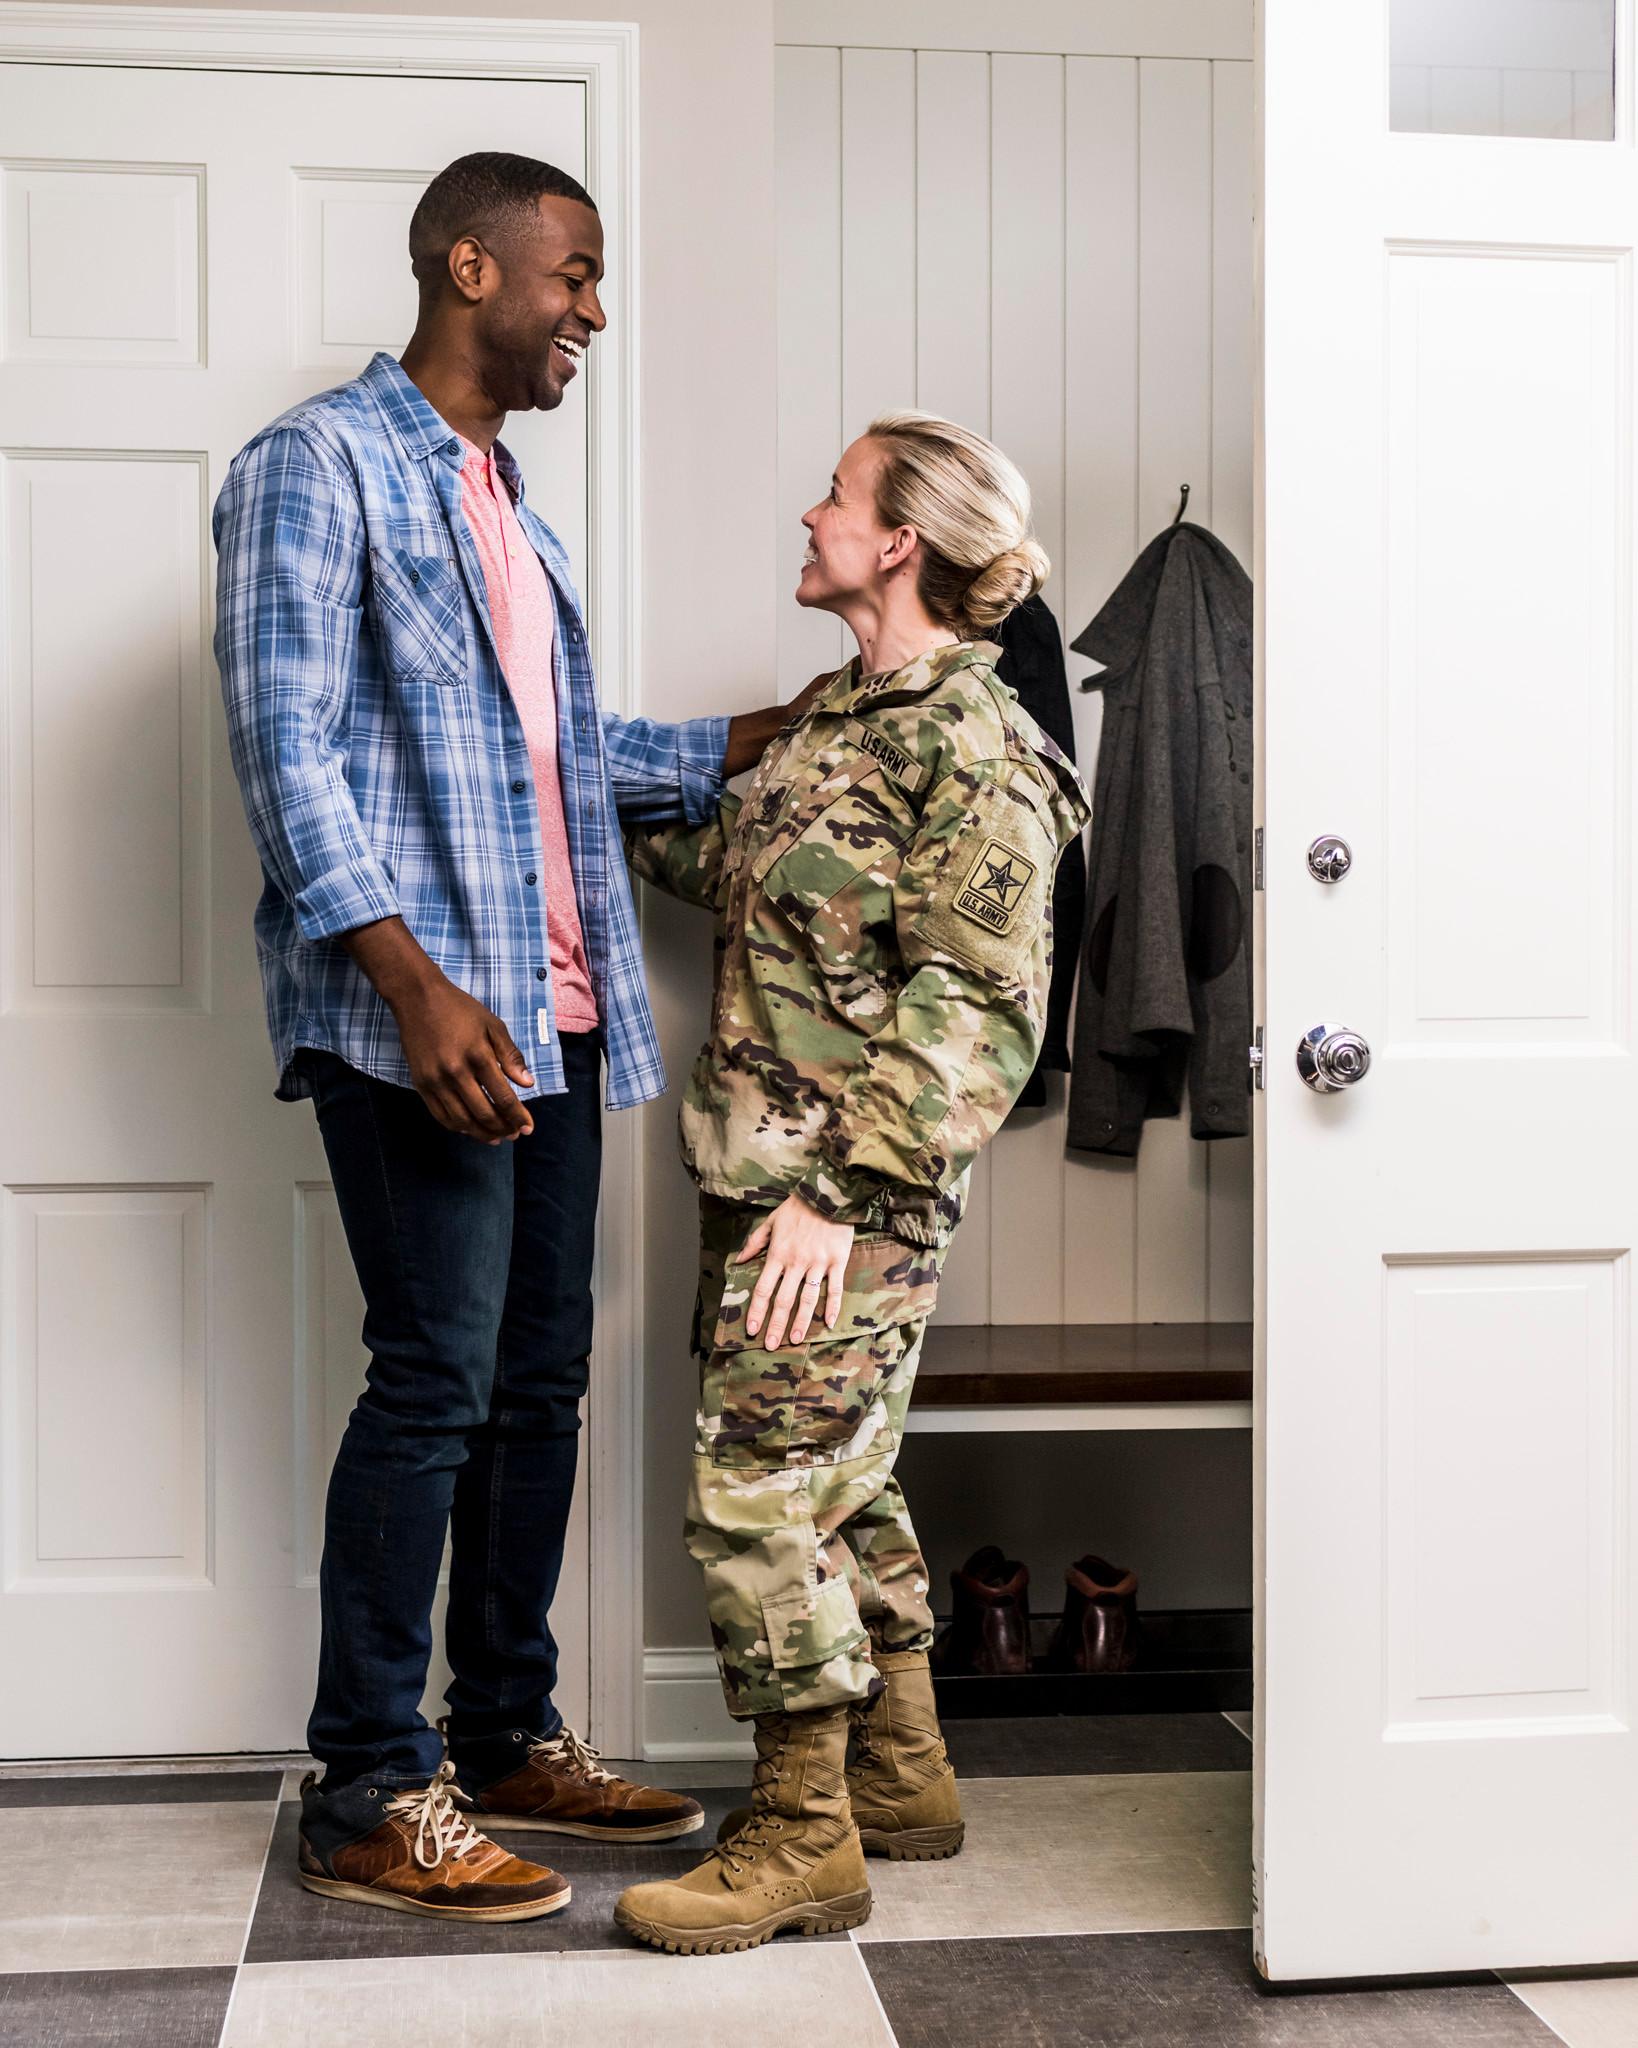 20180613_USBank_Military_Home_415.jpg